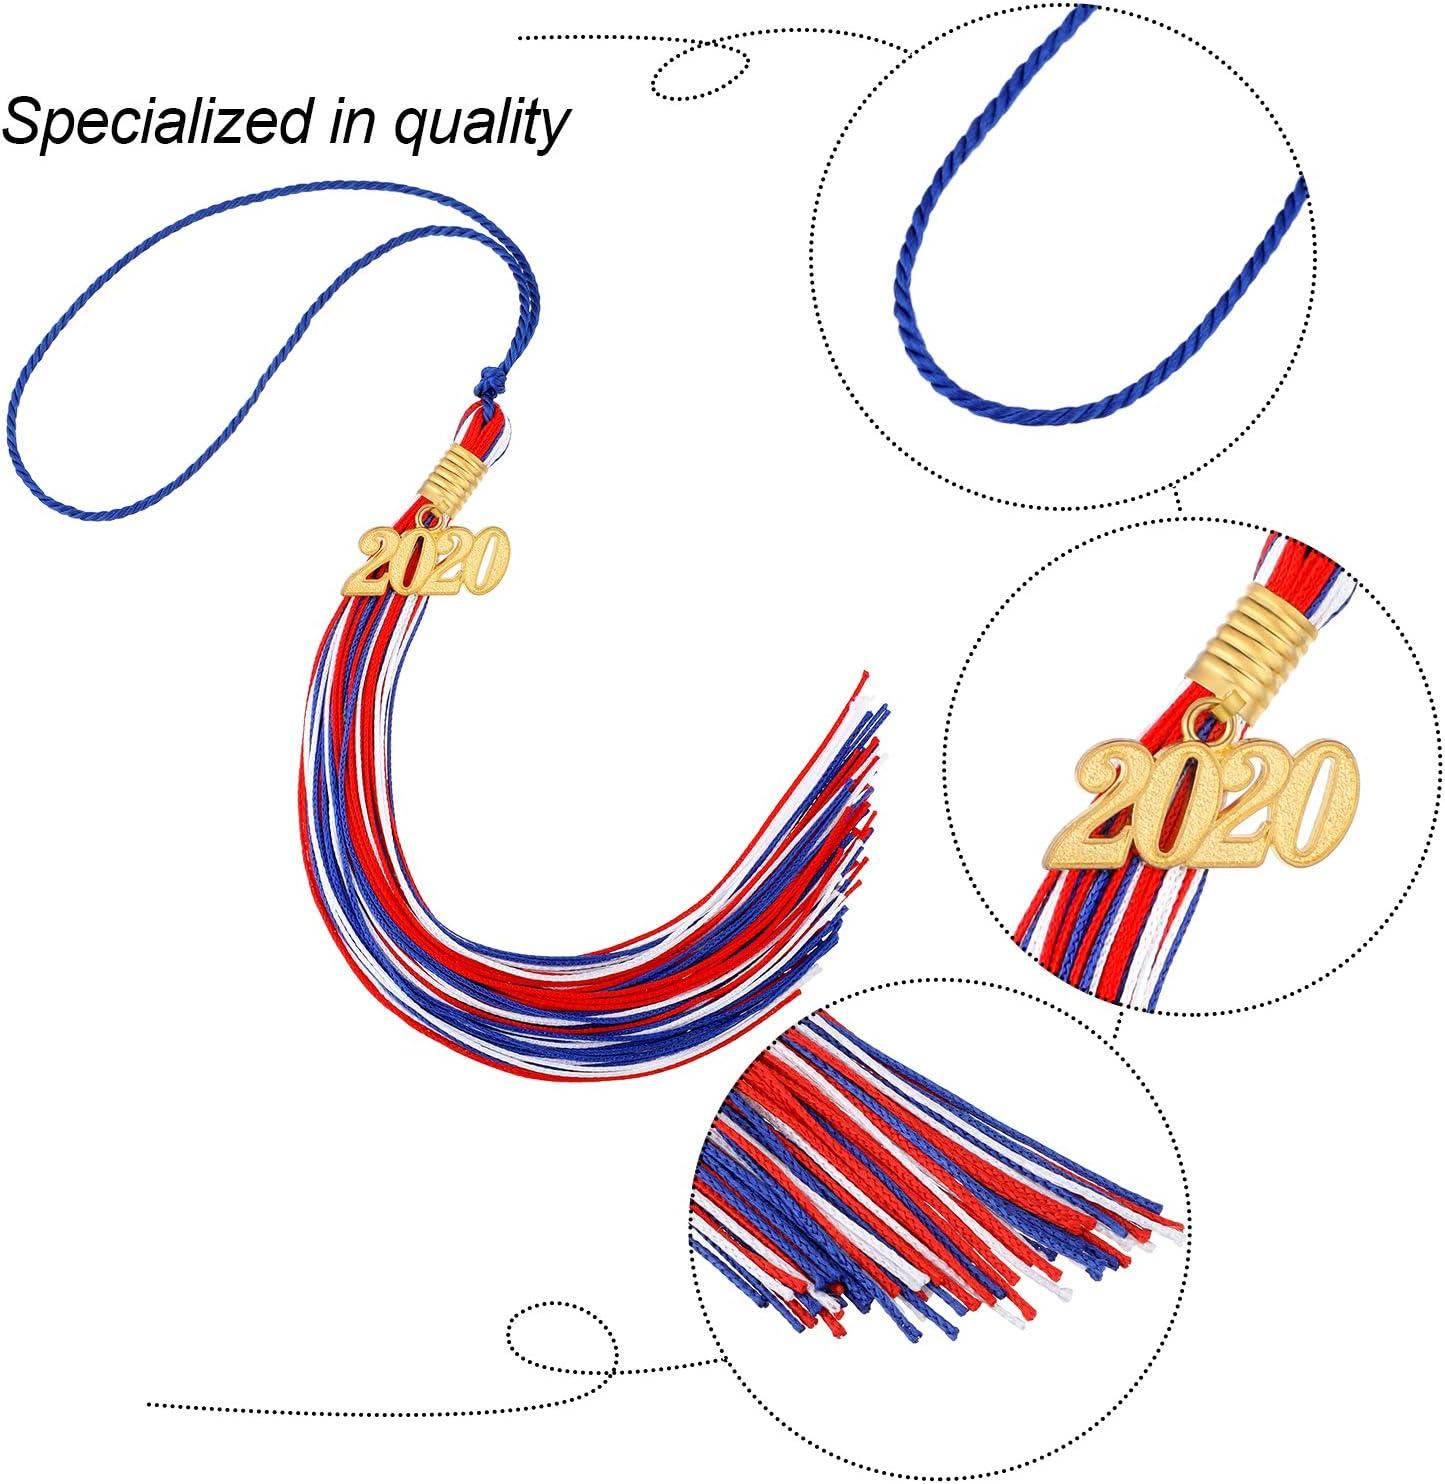 Graduation Tassel Academic Graduation Tassel with 2020 Year Charm Ceremonies Accessories for Graduates Silvery